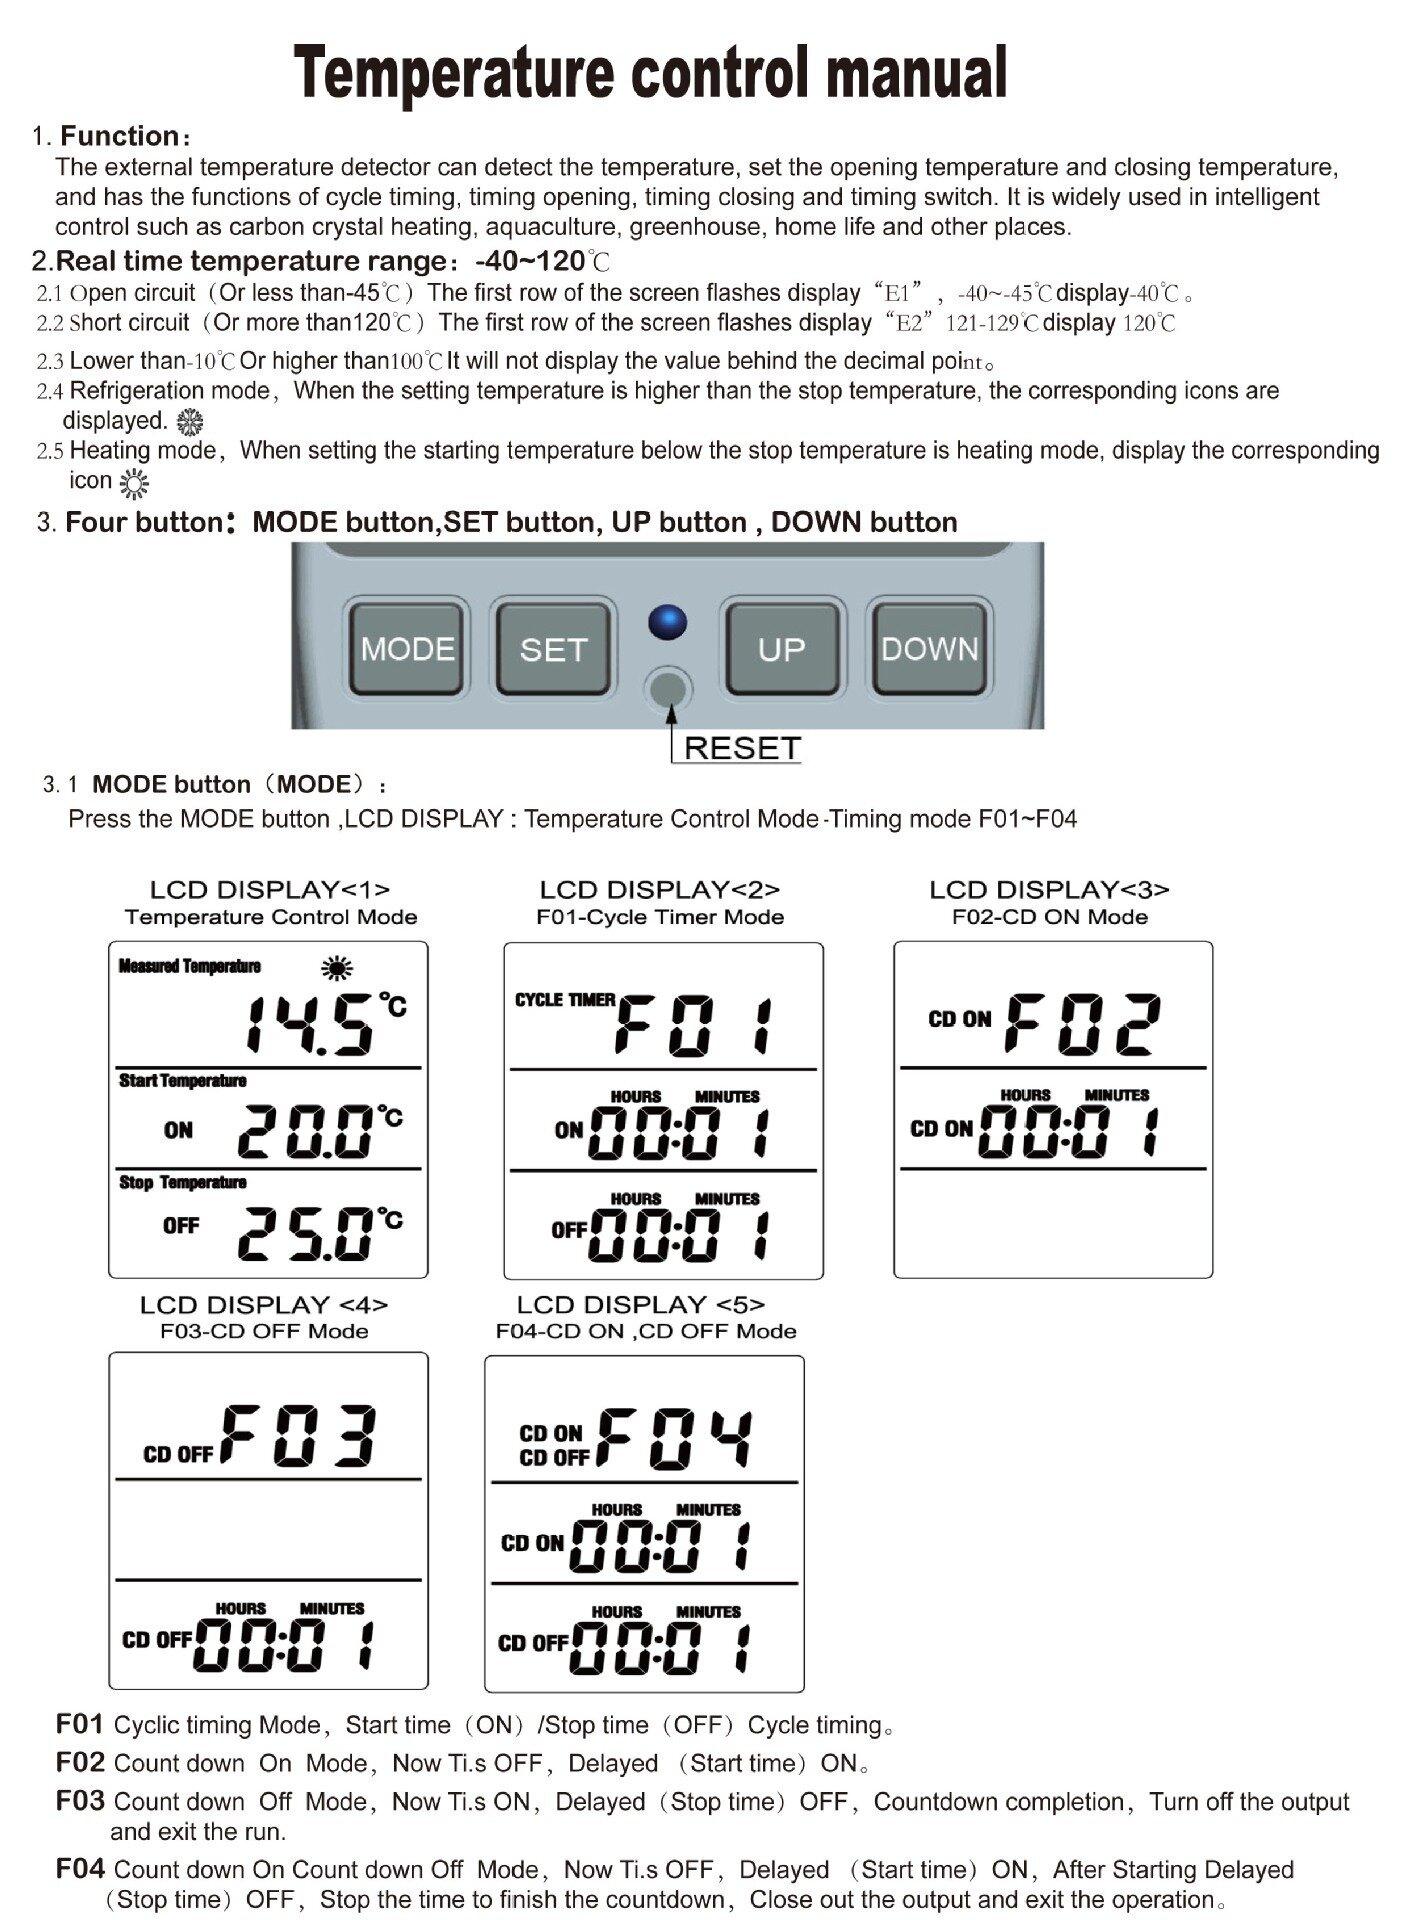 терморегулятор с таймером инструкция